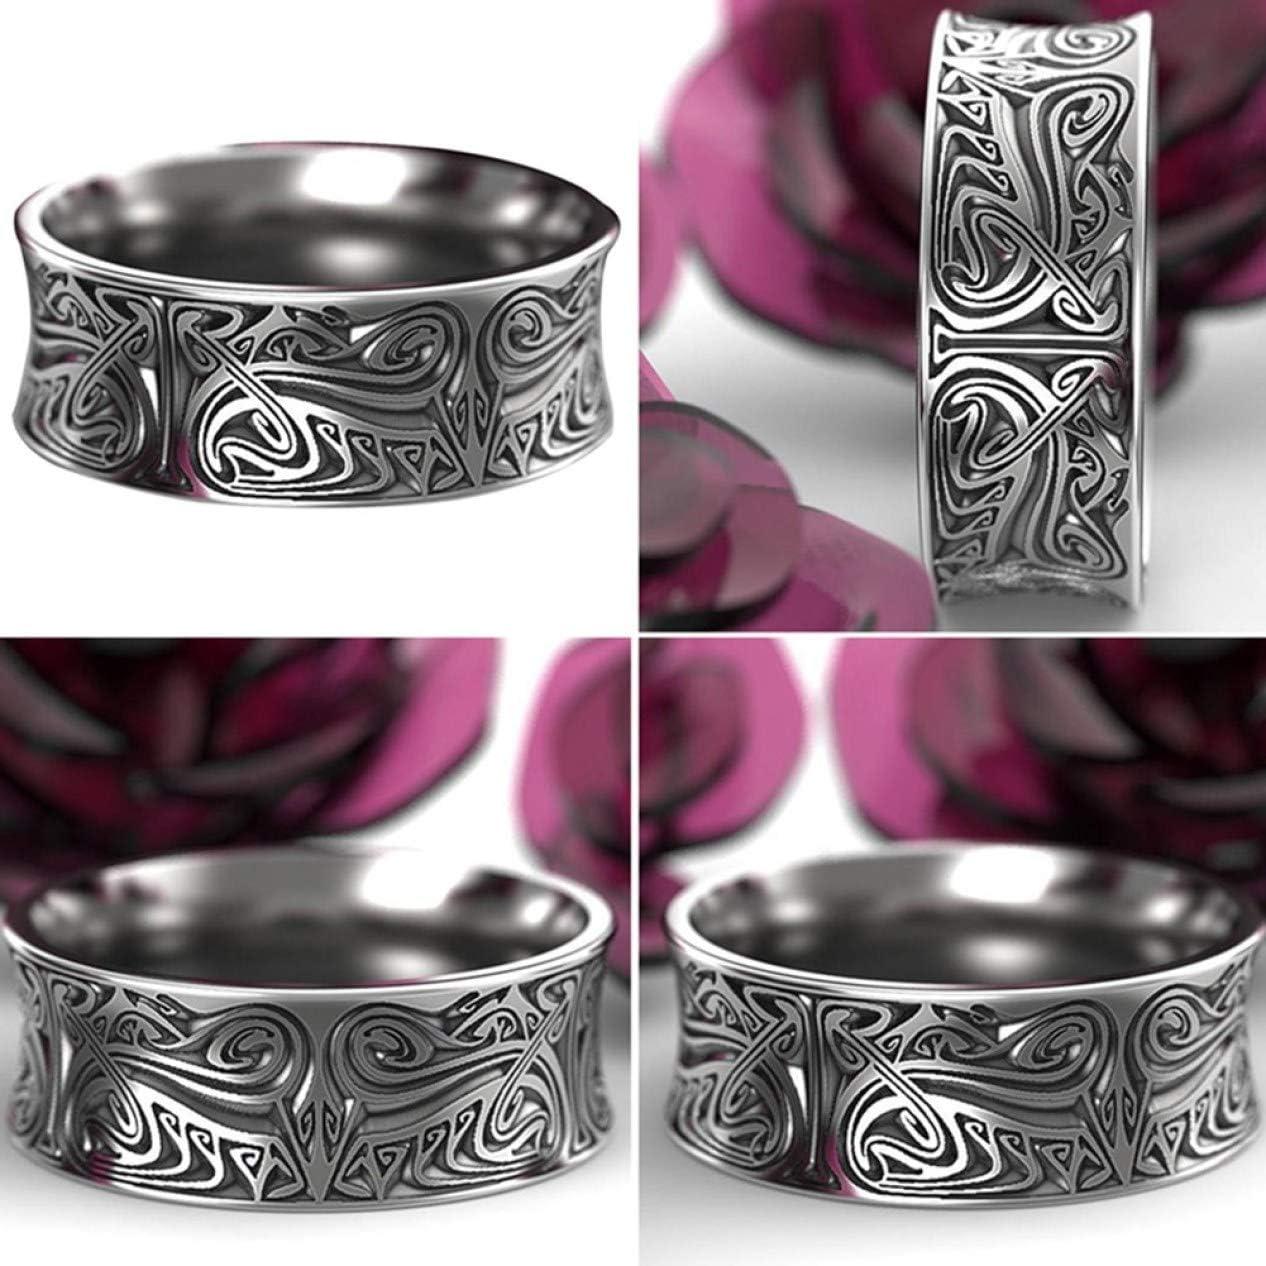 Jyuesi Classic Nordic Viking Antique Silver Engraved Norse Wedding Ring Men Ring